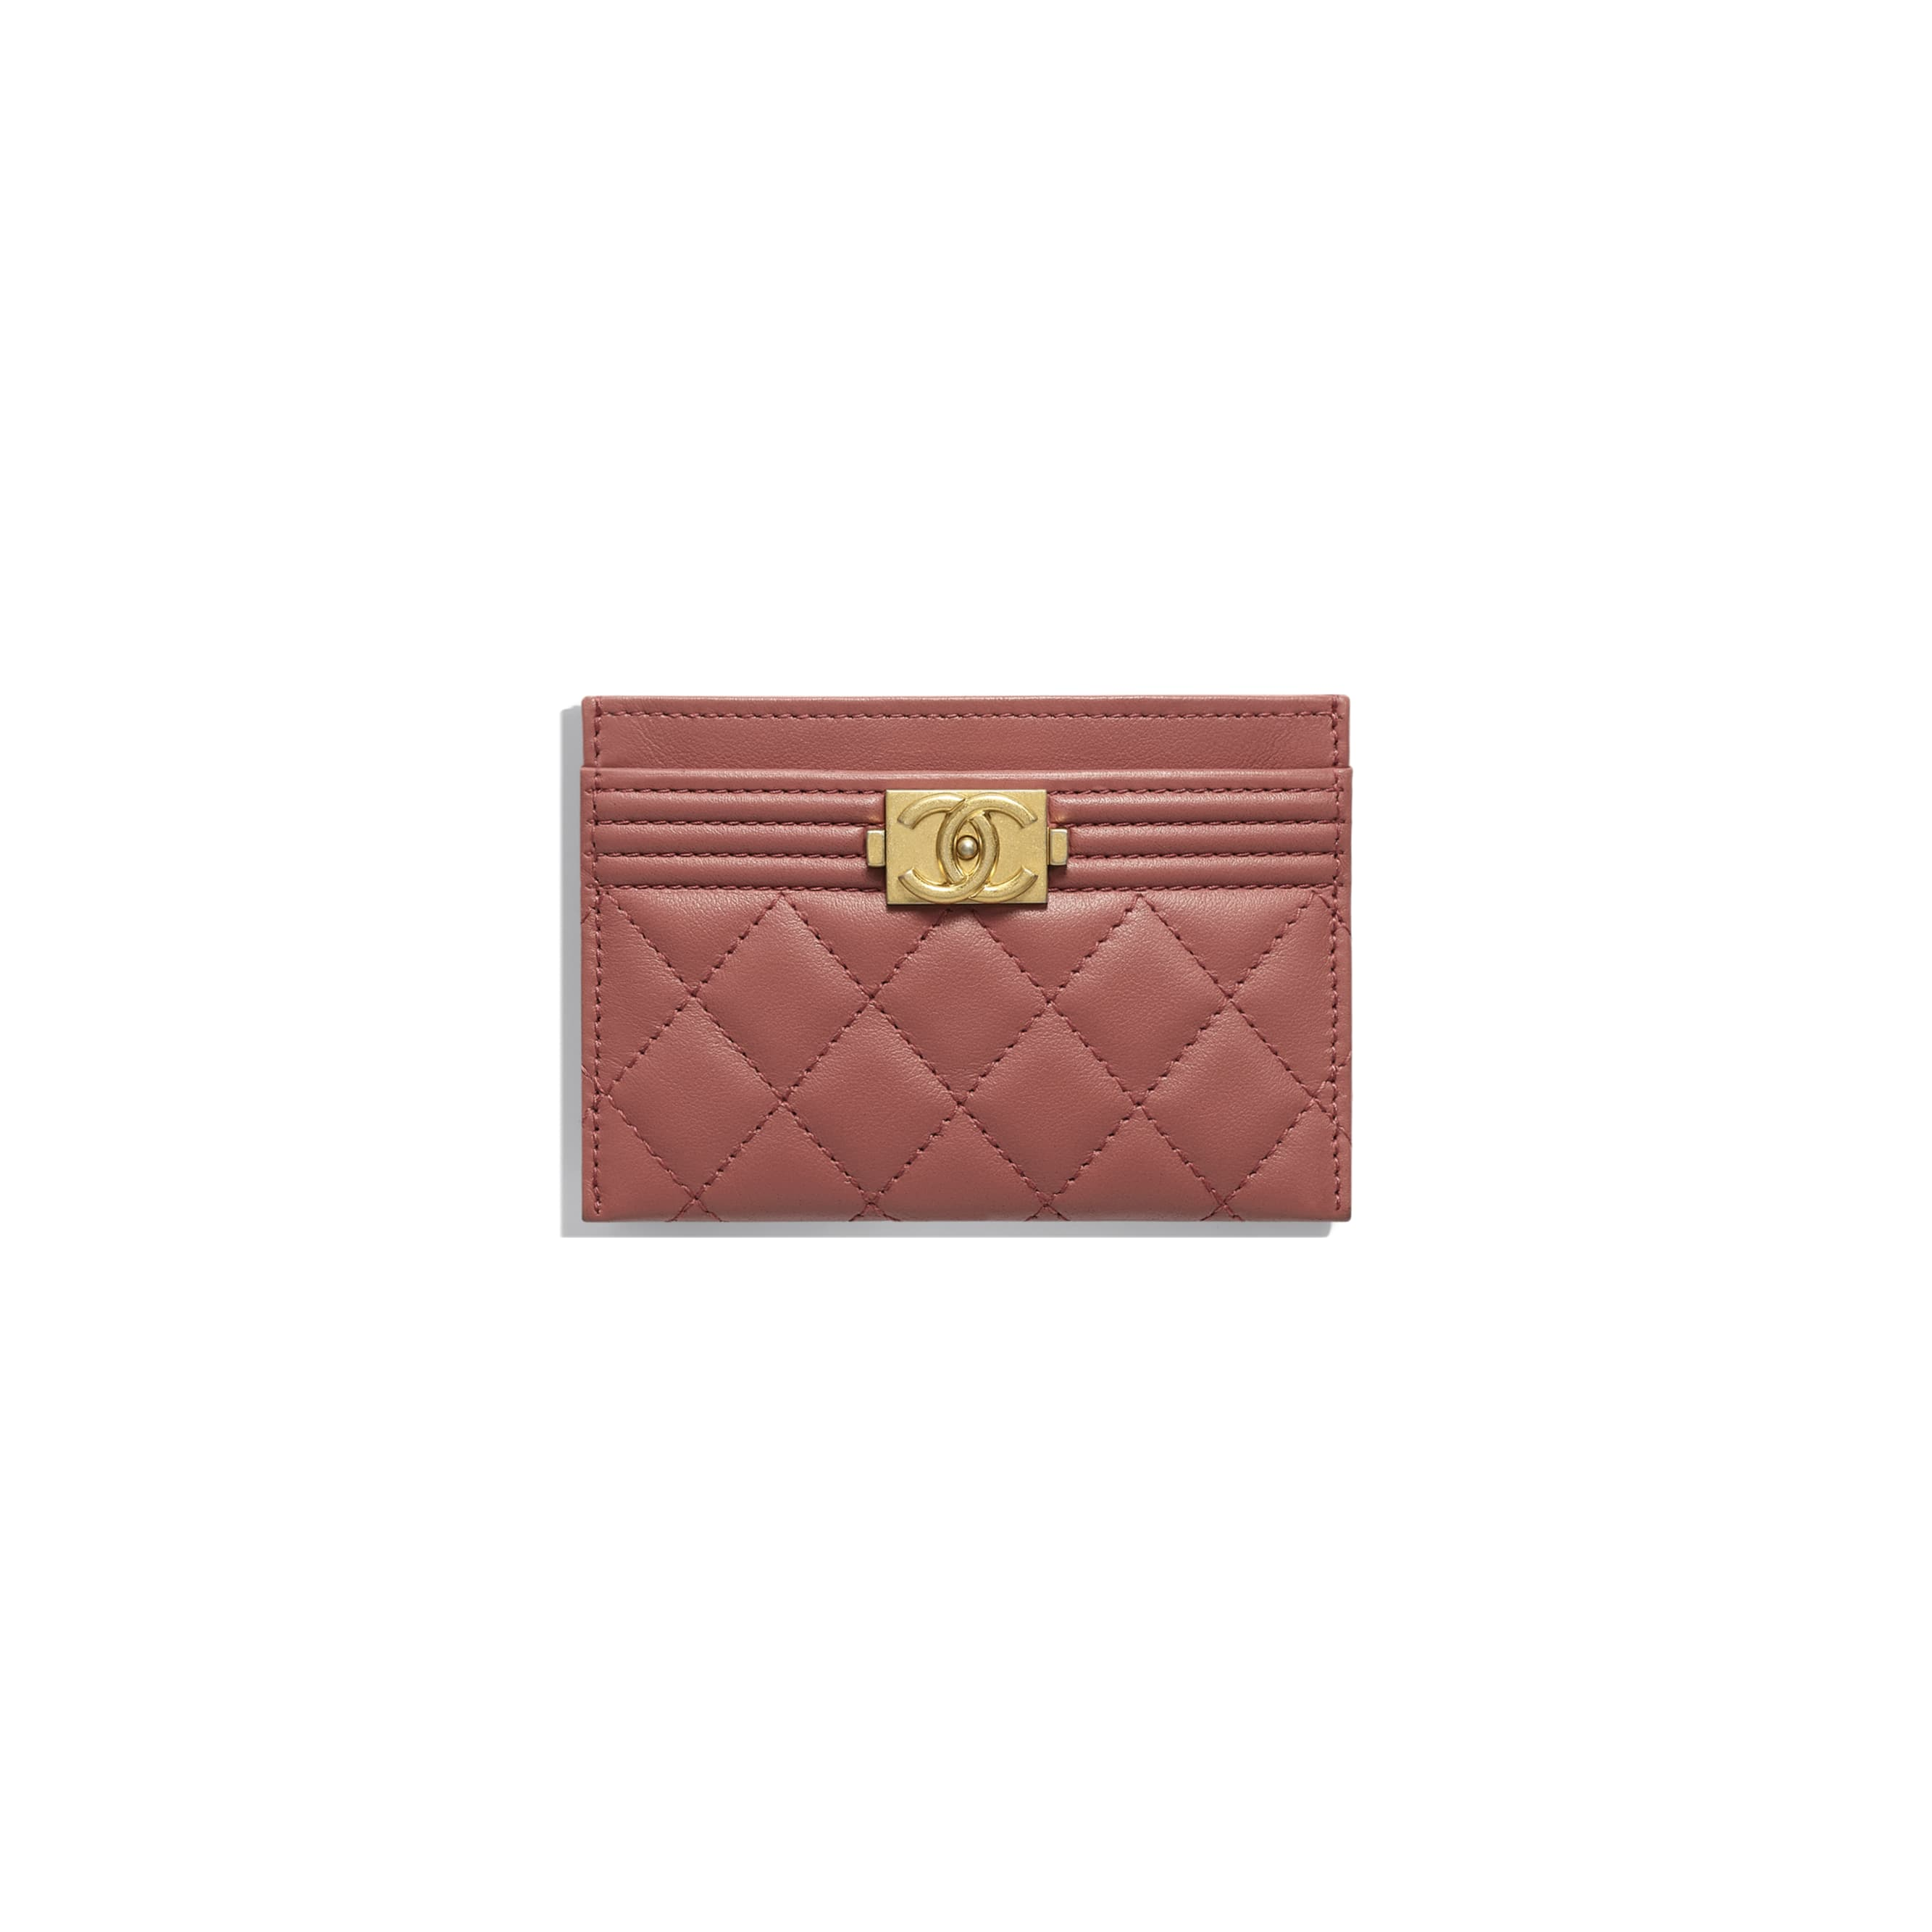 BOY CHANEL Card Holder - Dark Red - Calfskin & Gold-Tone Metal - Default view - see standard sized version